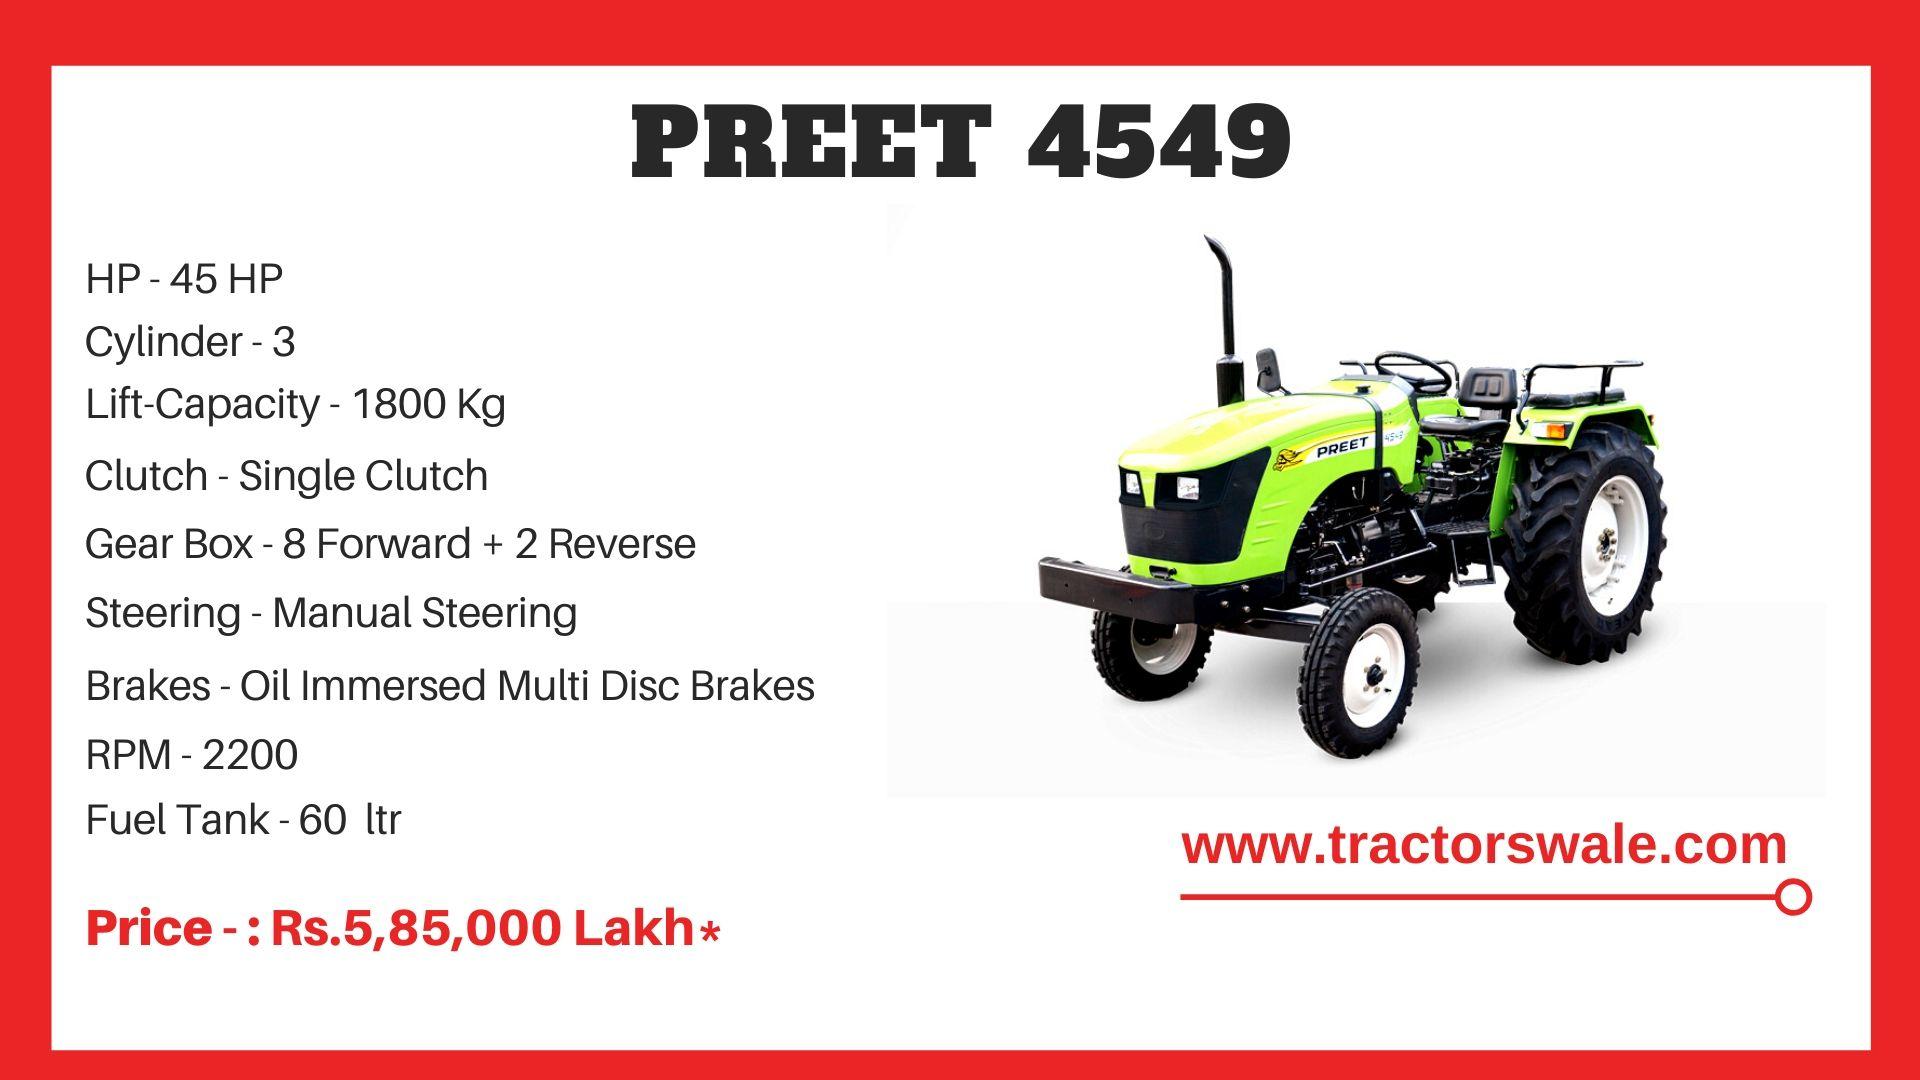 Preet 4549 tractor price